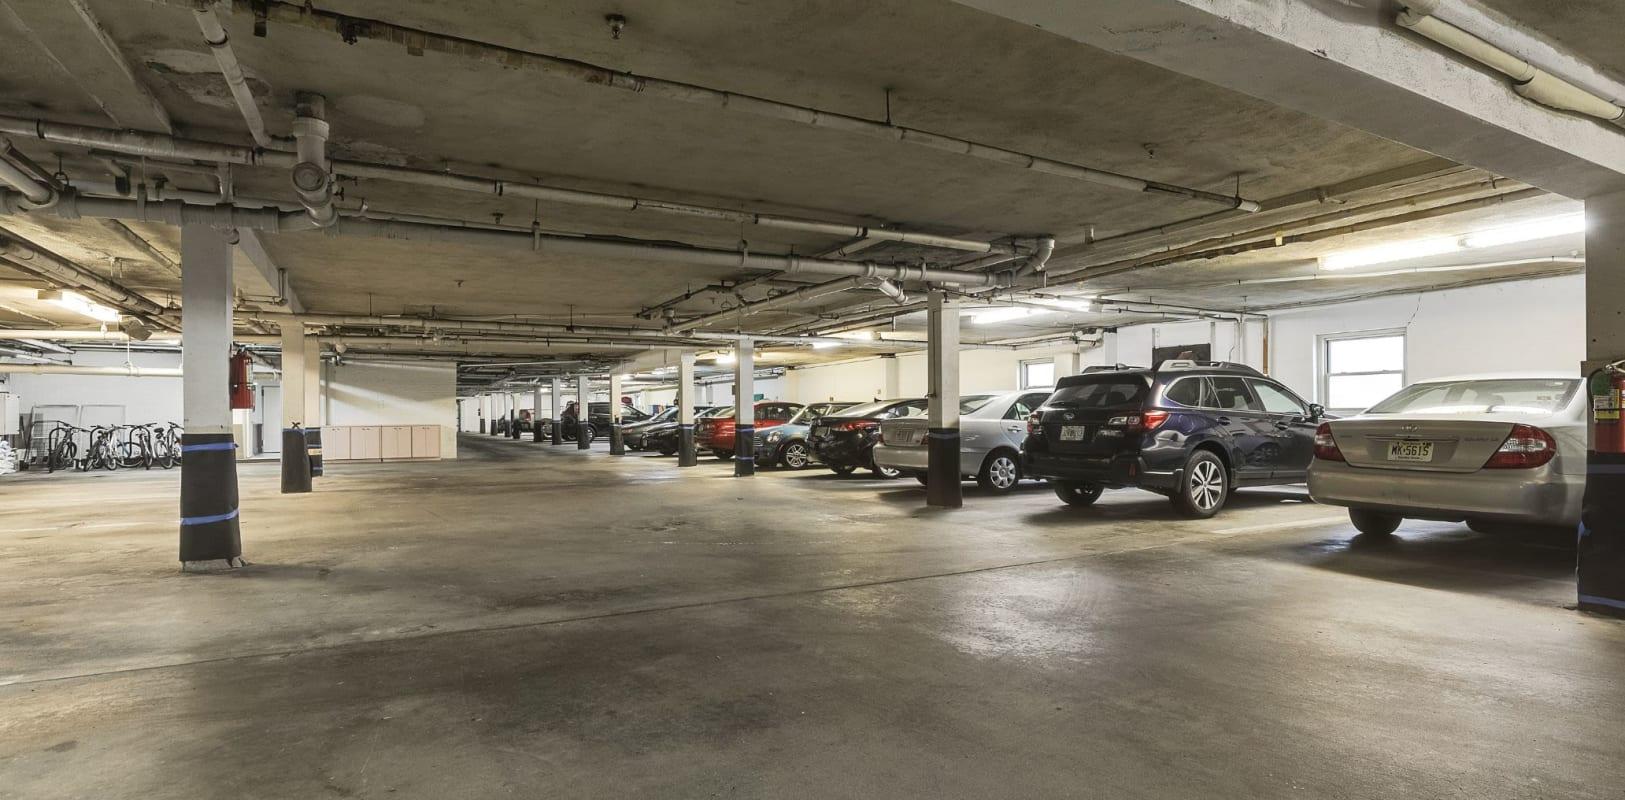 Parking garage at Hamilton Court in Morristown, New Jersey